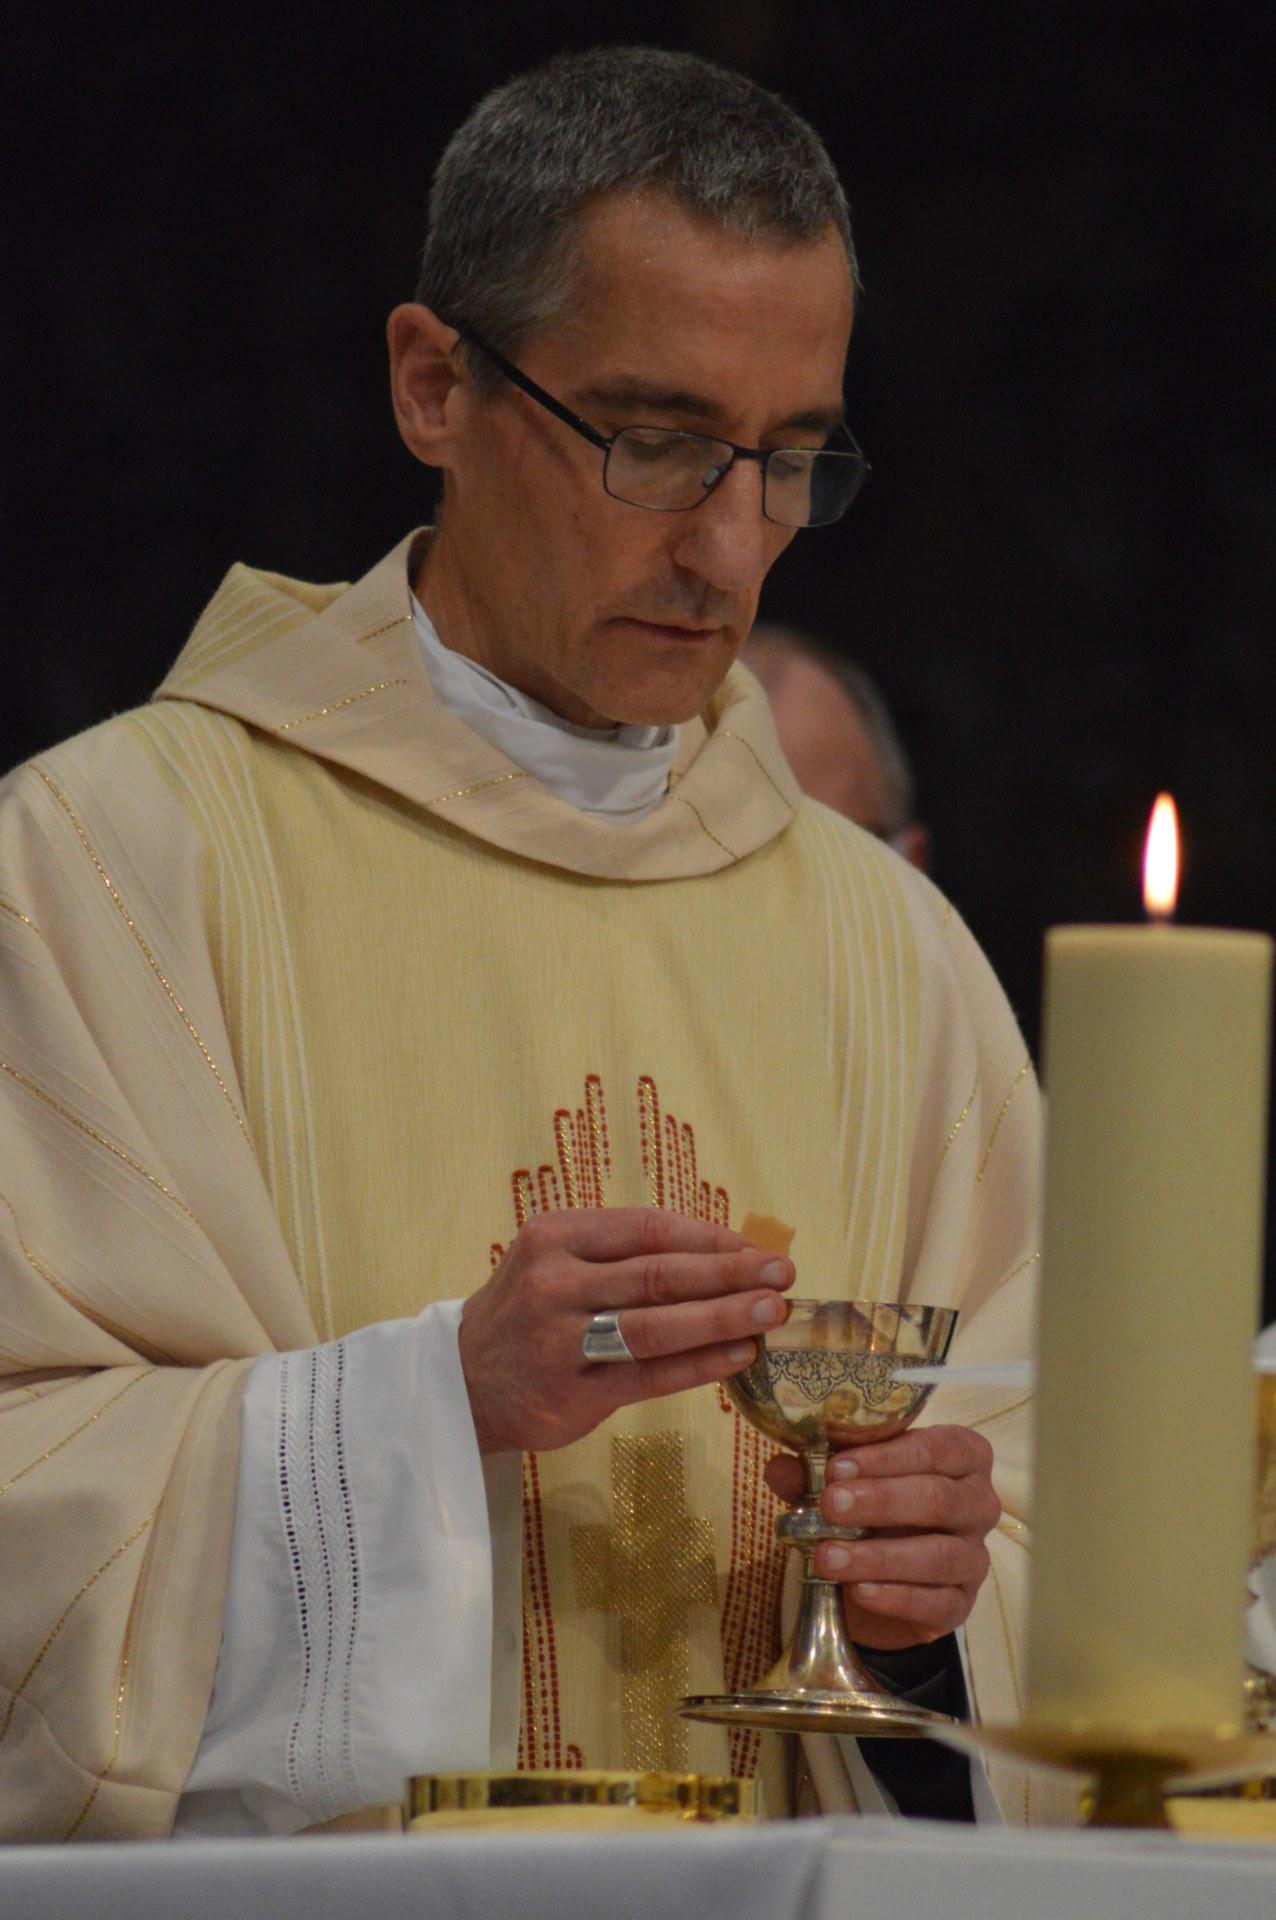 église st martin st amand 110921 29